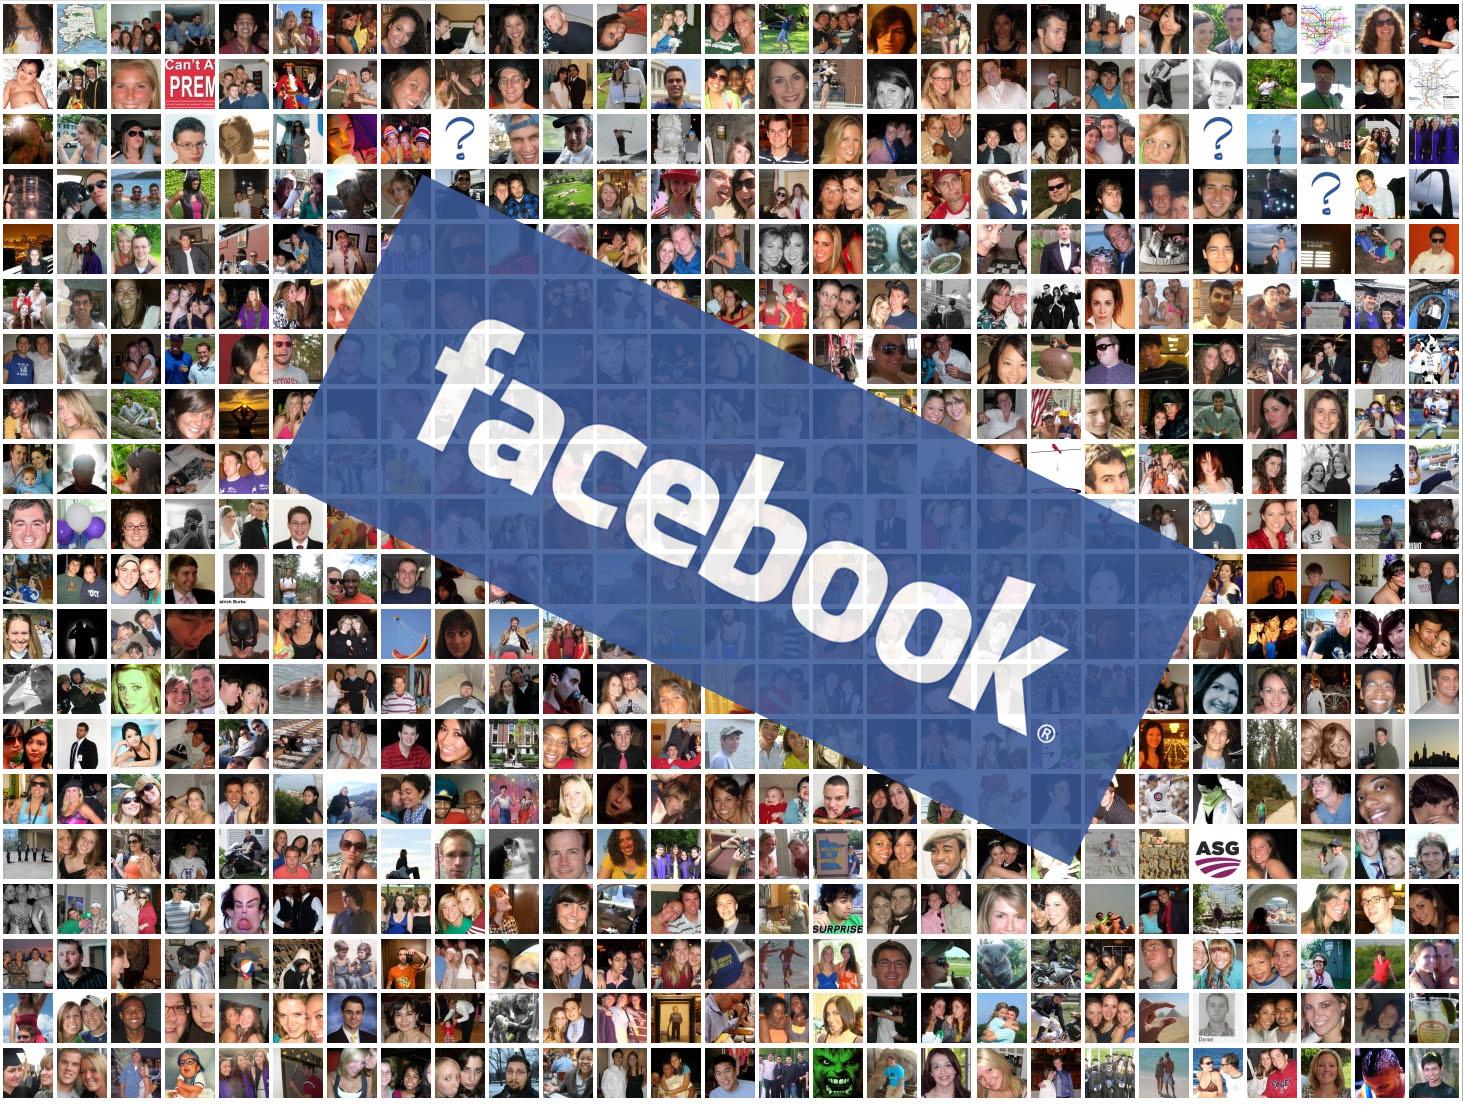 fotosenfacebook